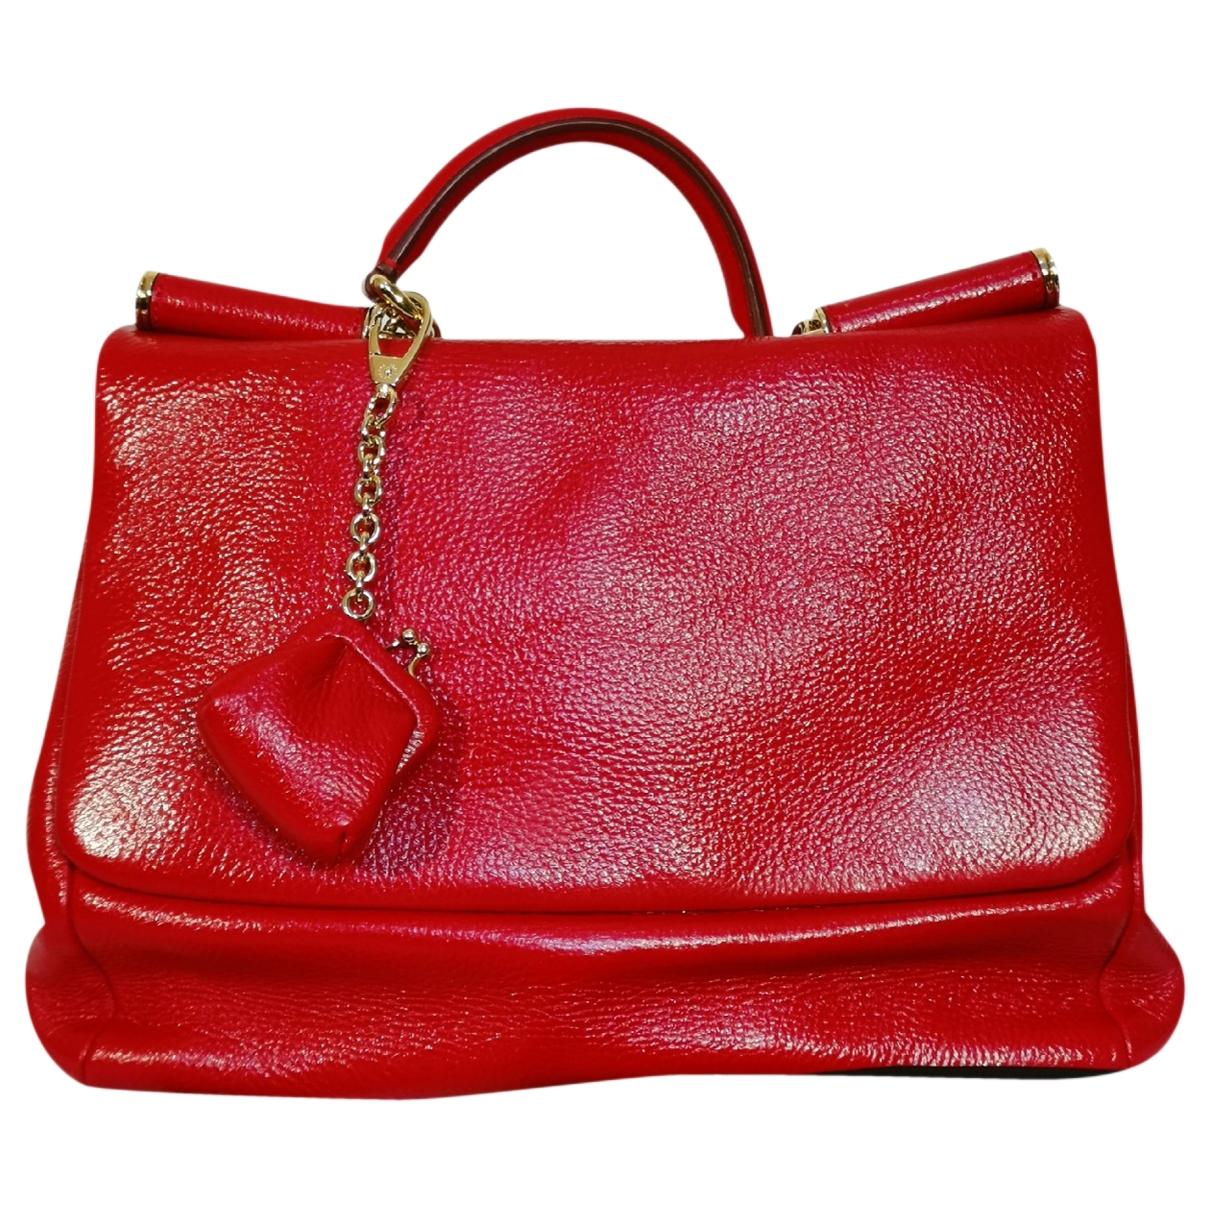 Dolce & Gabbana Sicily Red Patent leather handbag for Women \N